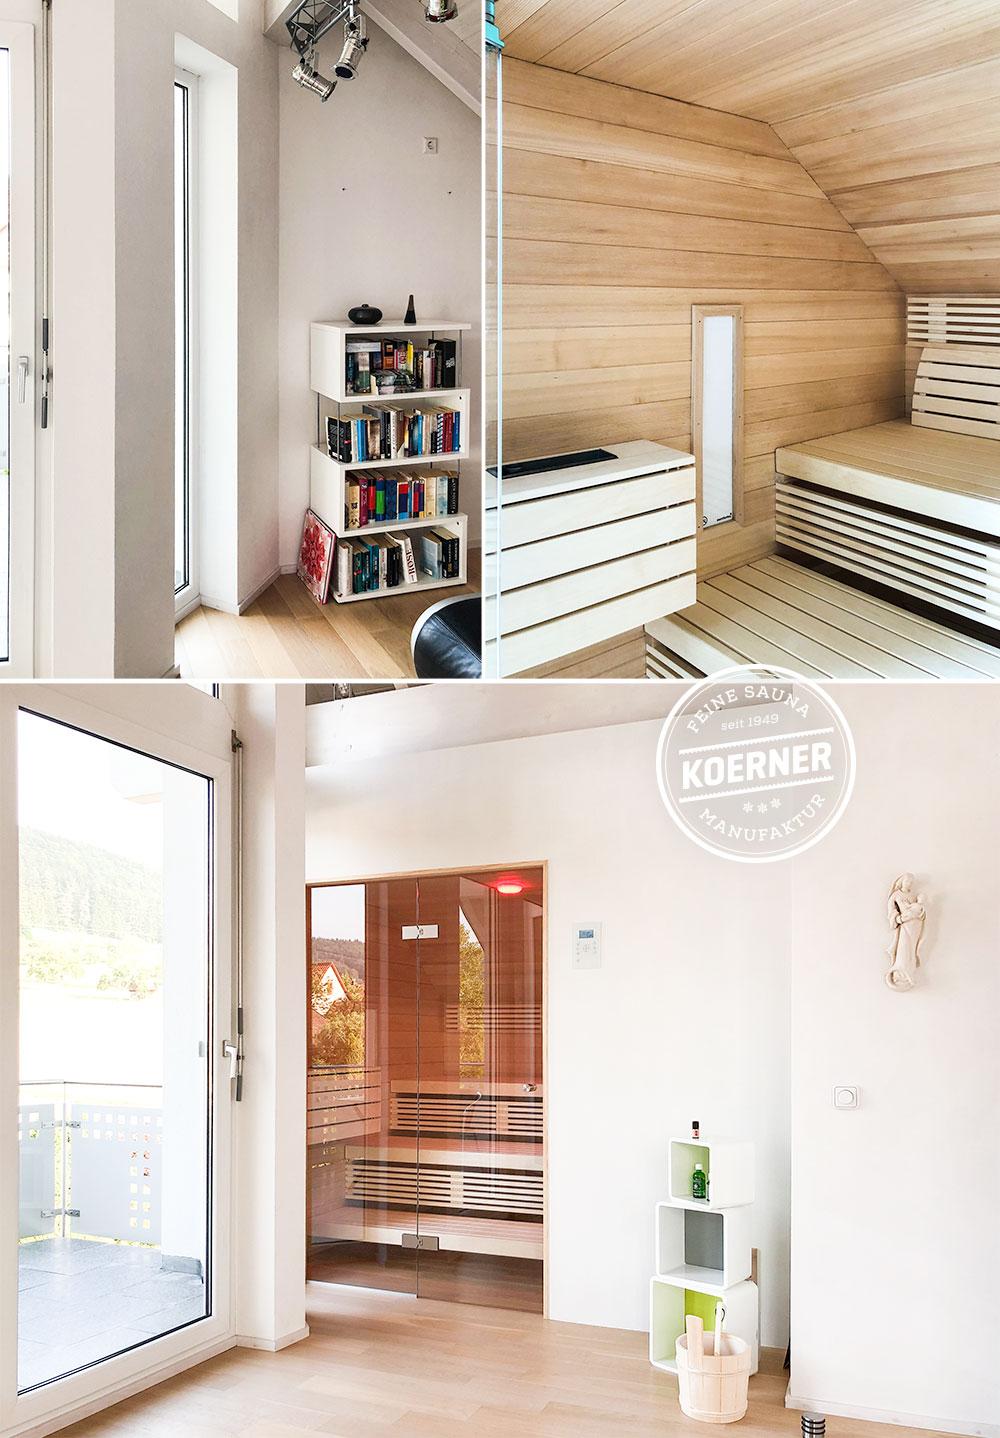 KOERNER Sauna statt Leseecke